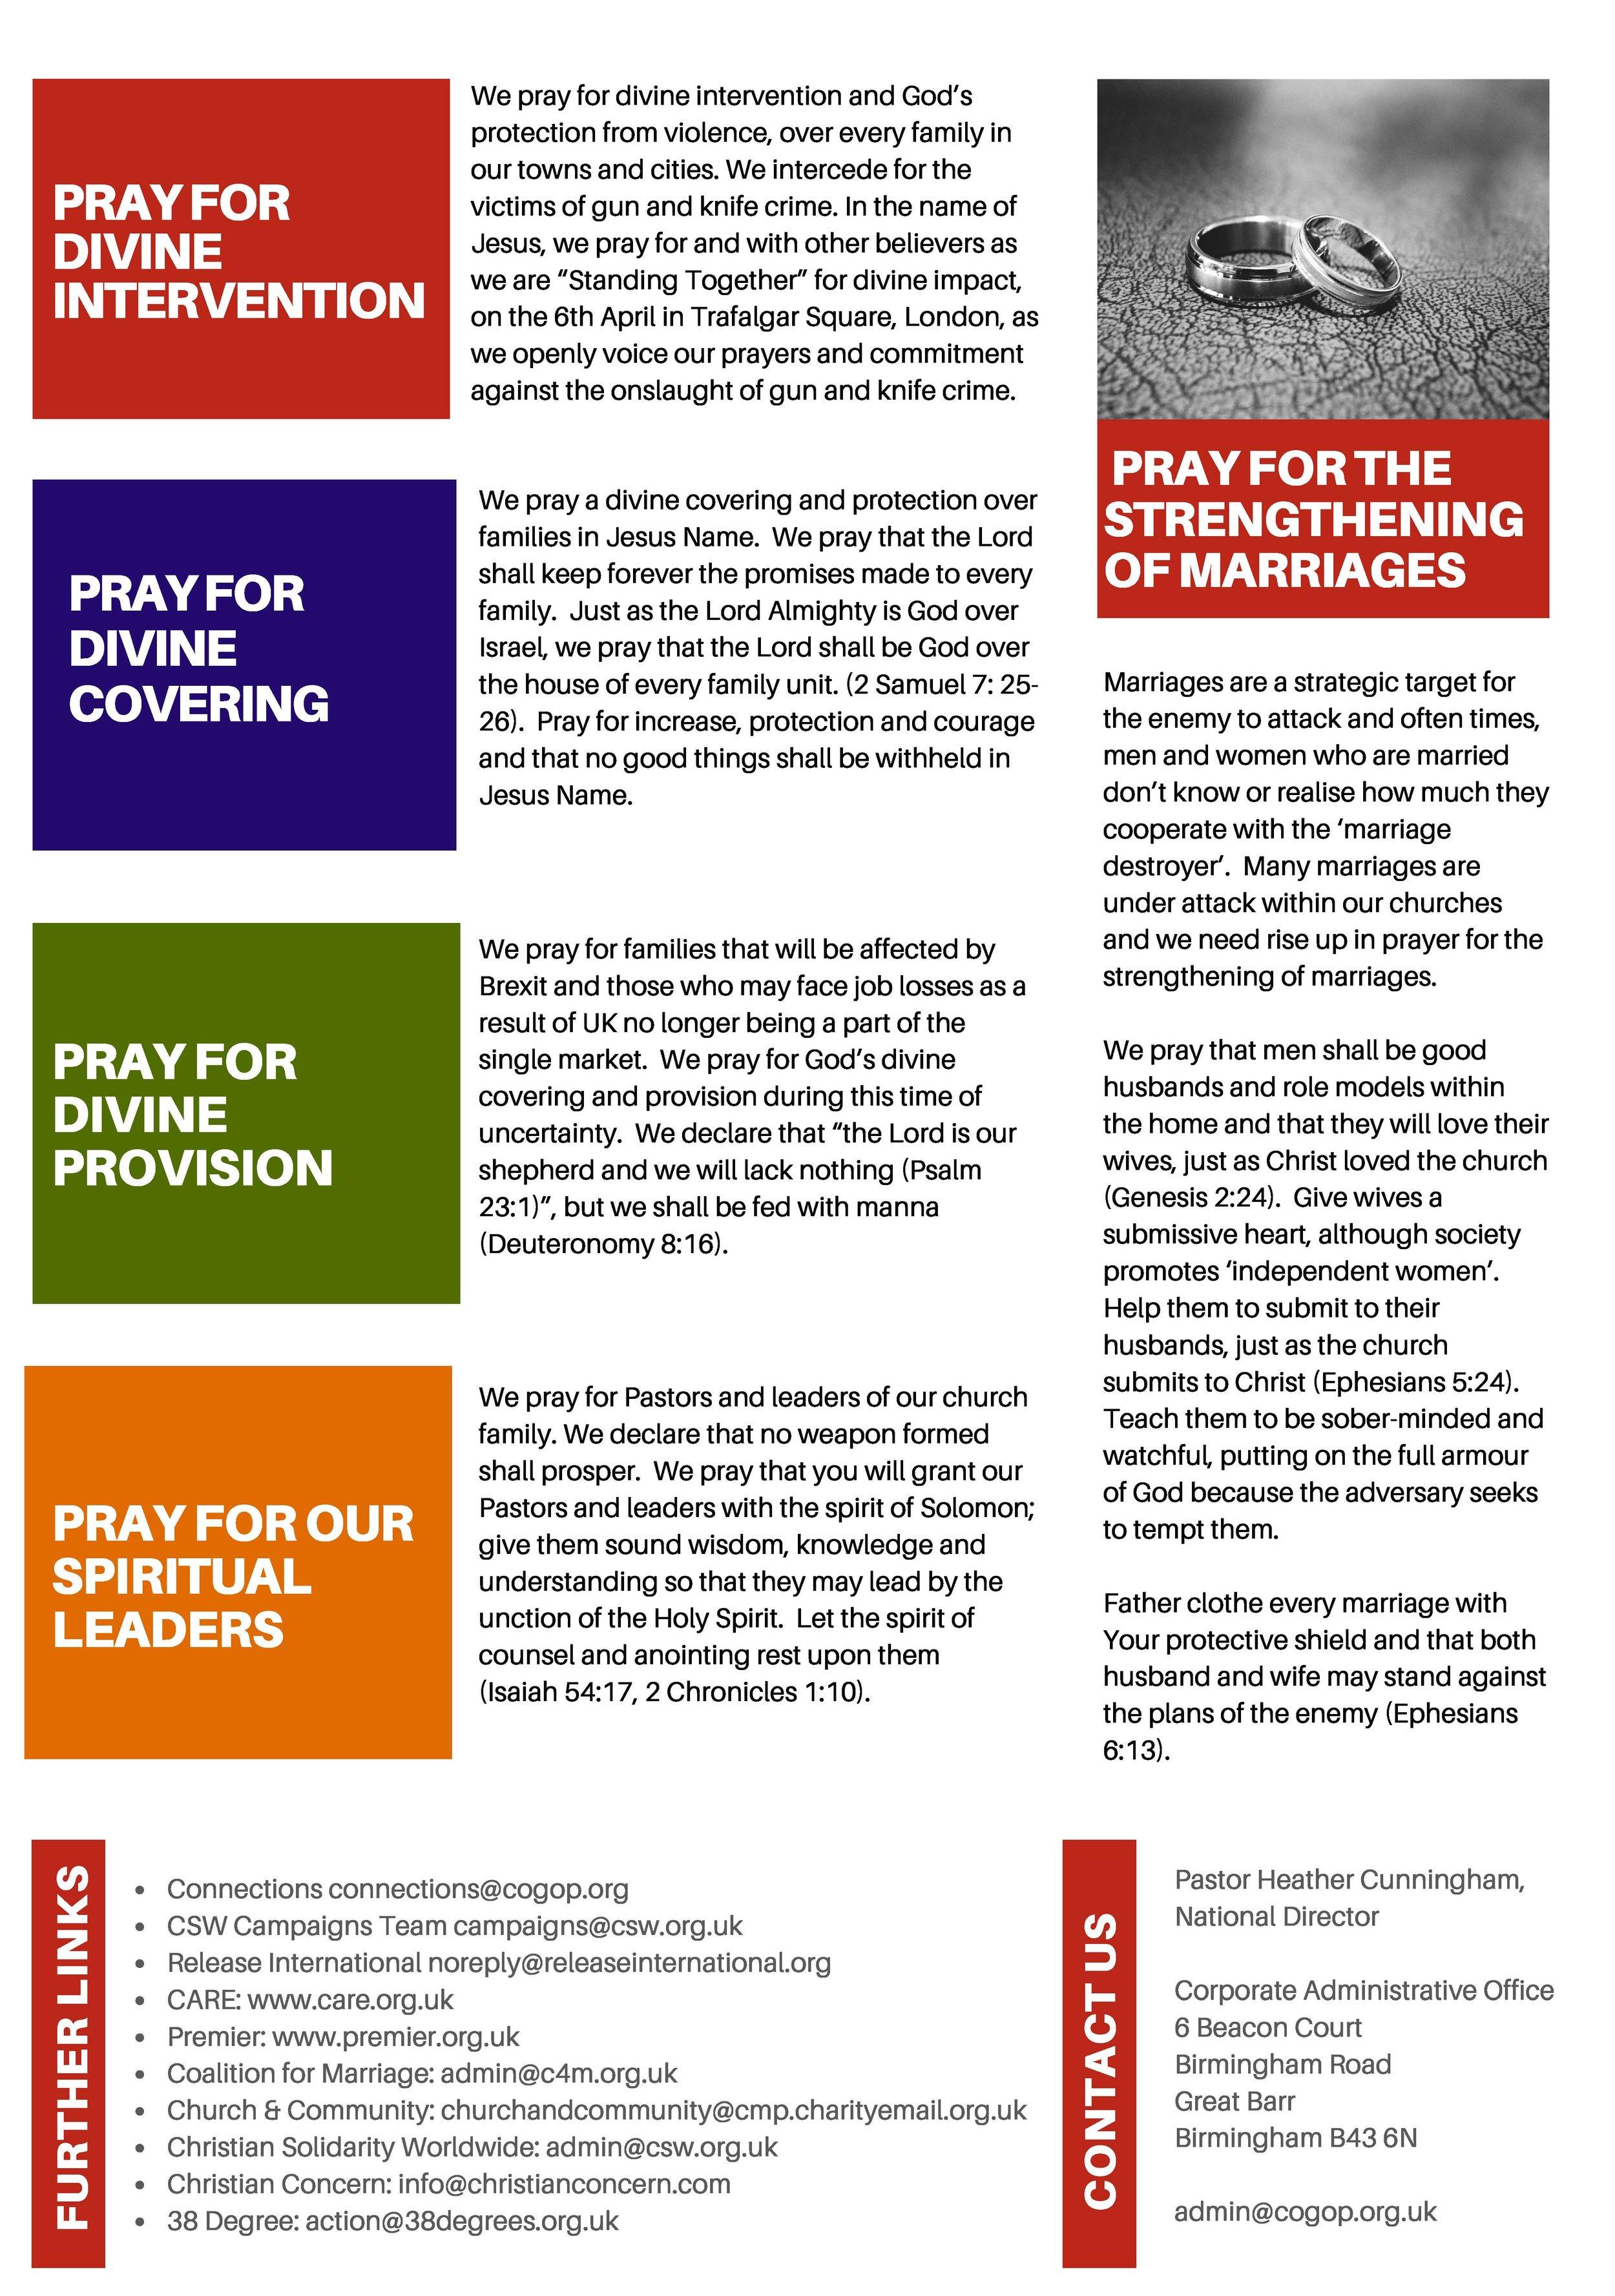 Corporate Prayer Newsletter - APRIL 2019 2_Page_2.jpg